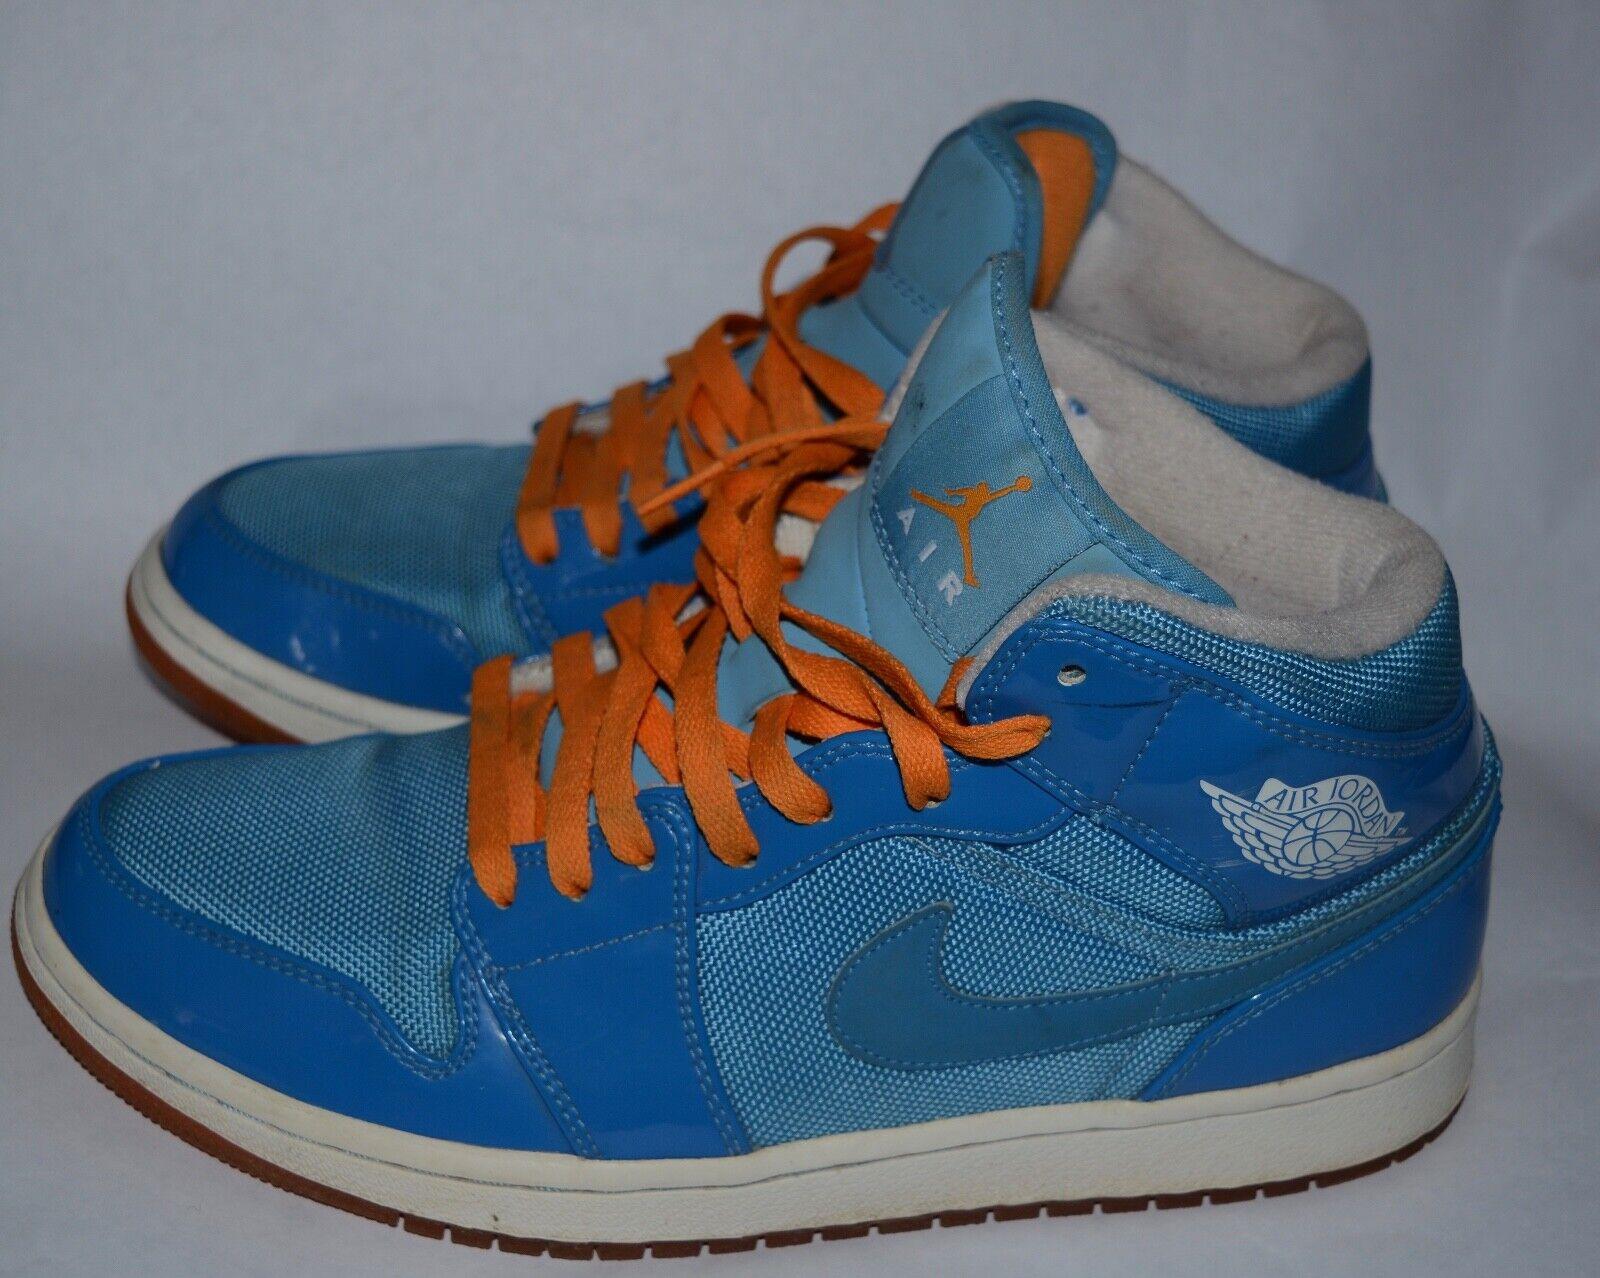 Nike Air Jordan 1 One Phat Mid Year Of Of Of The Dragon bluee orange 364770-403 Sz 8.5 c967c8